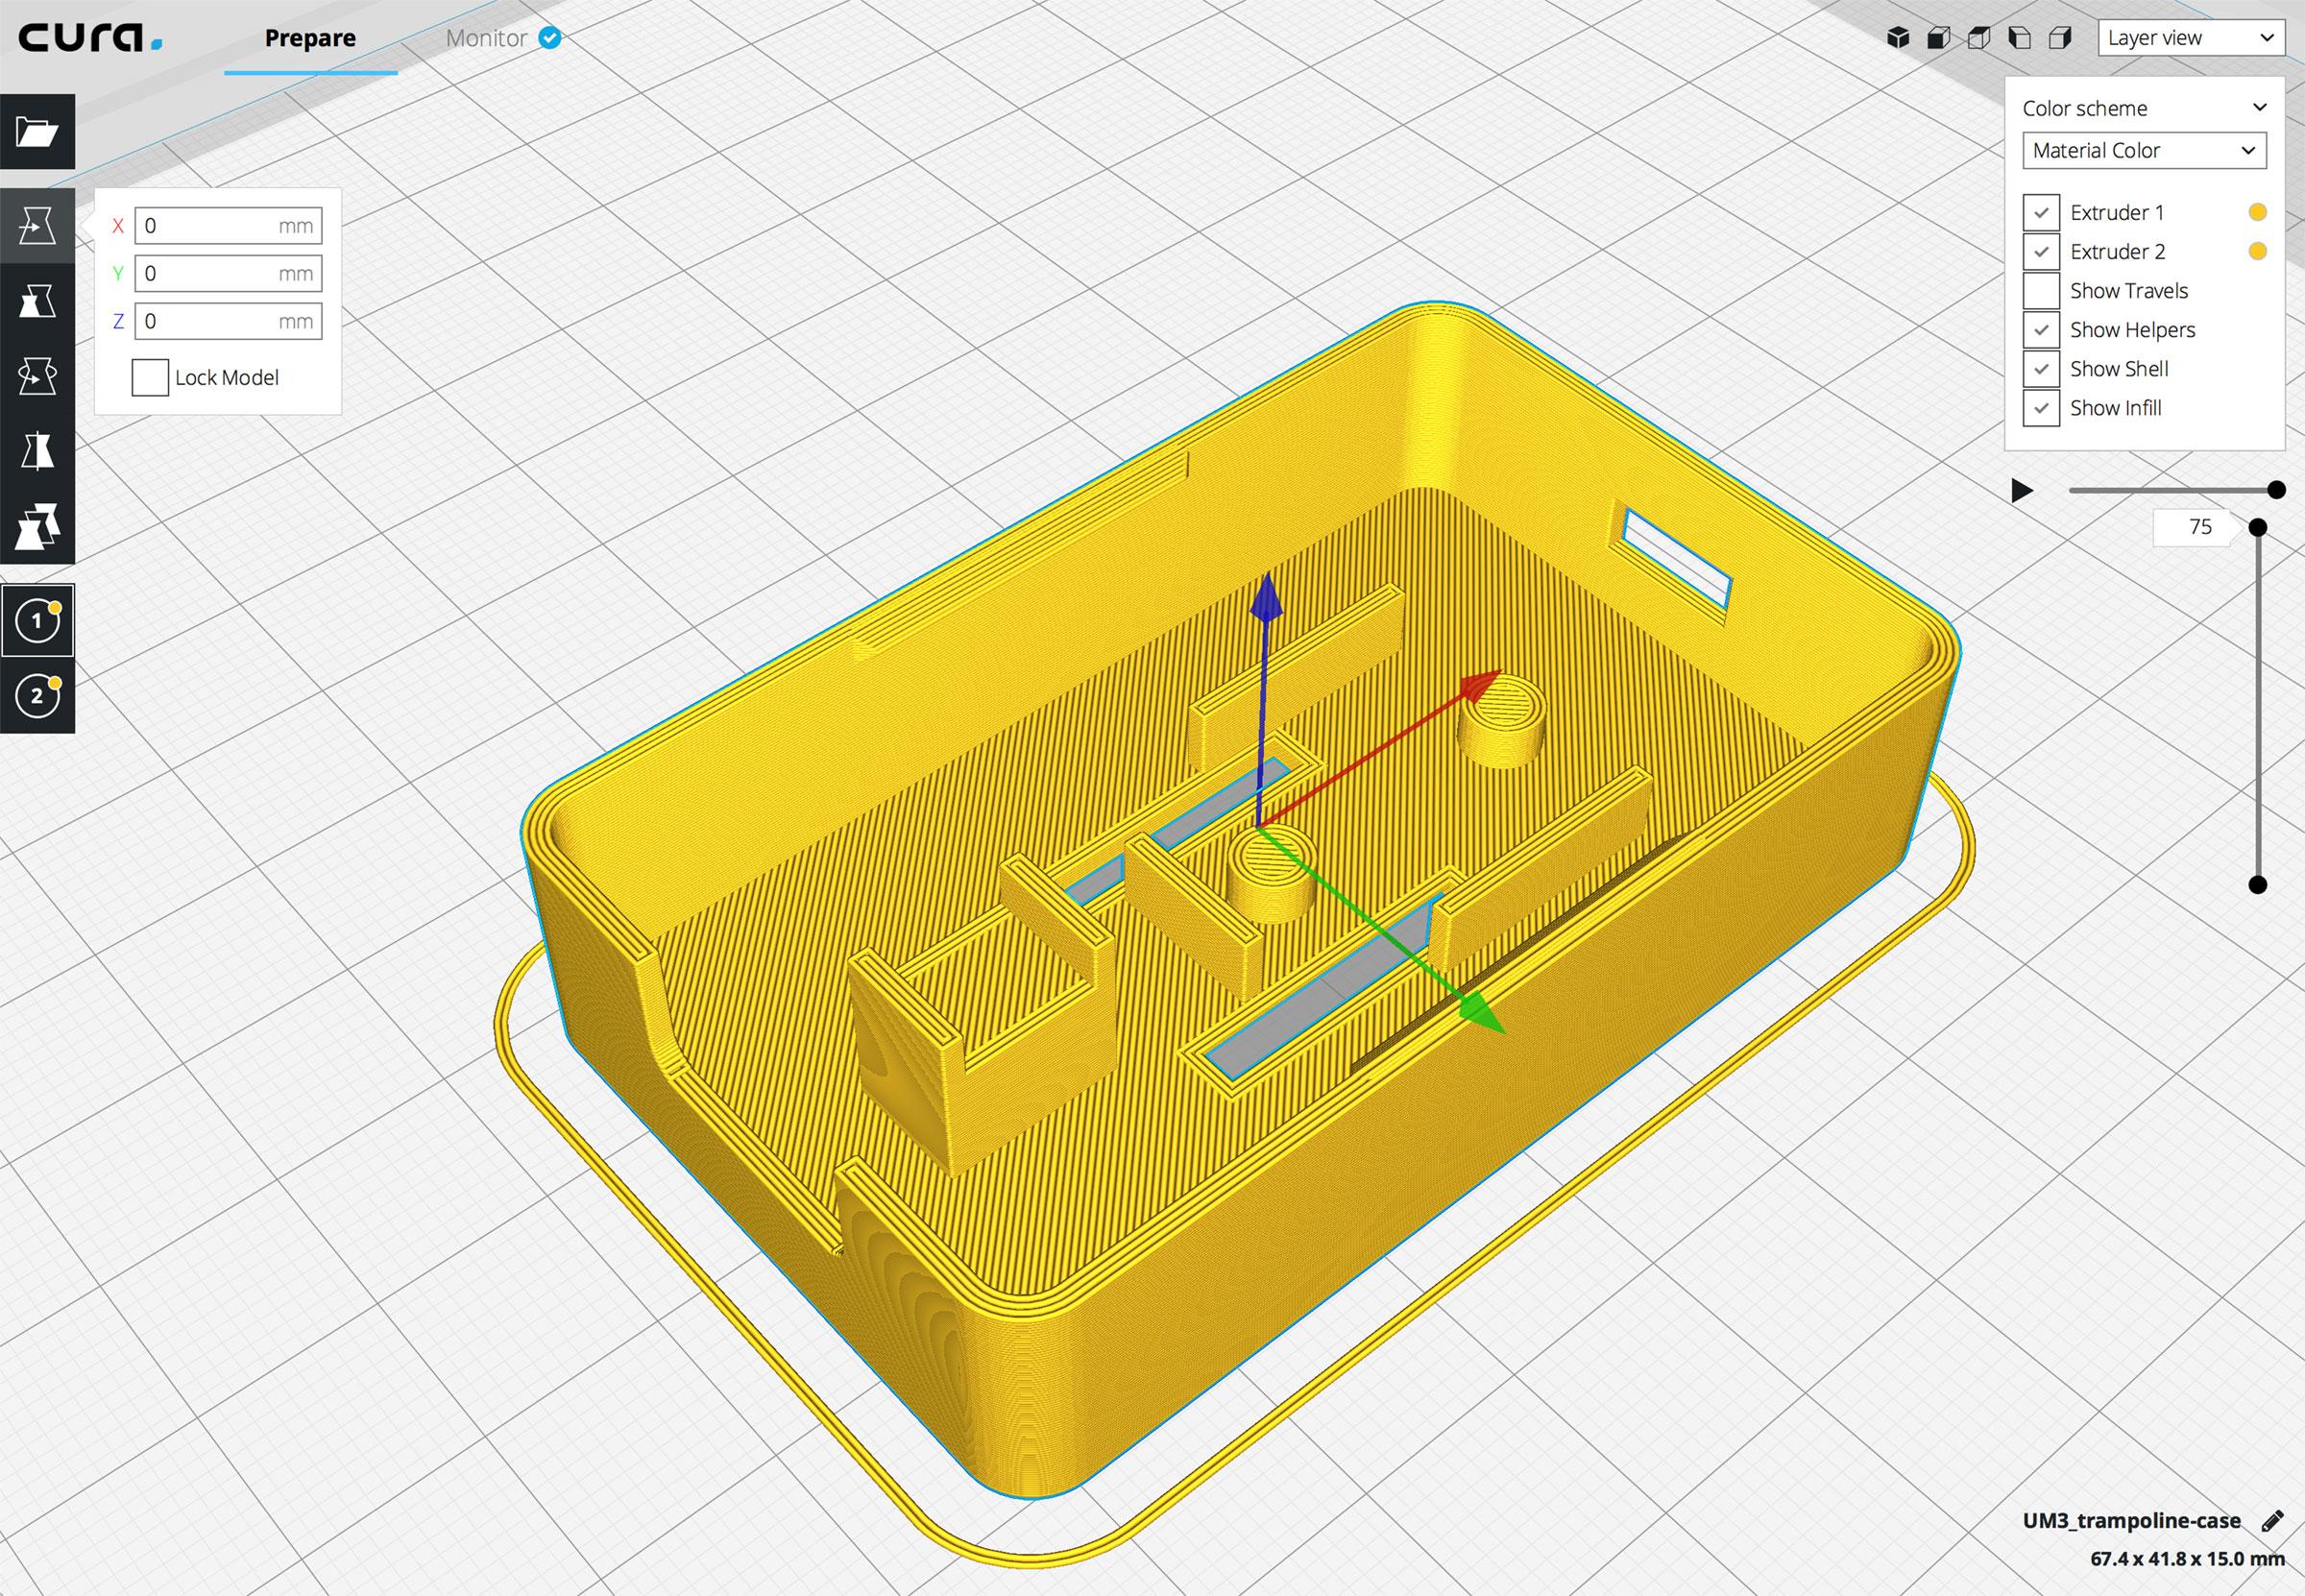 led_strips_cura-case-toolpaths.jpg